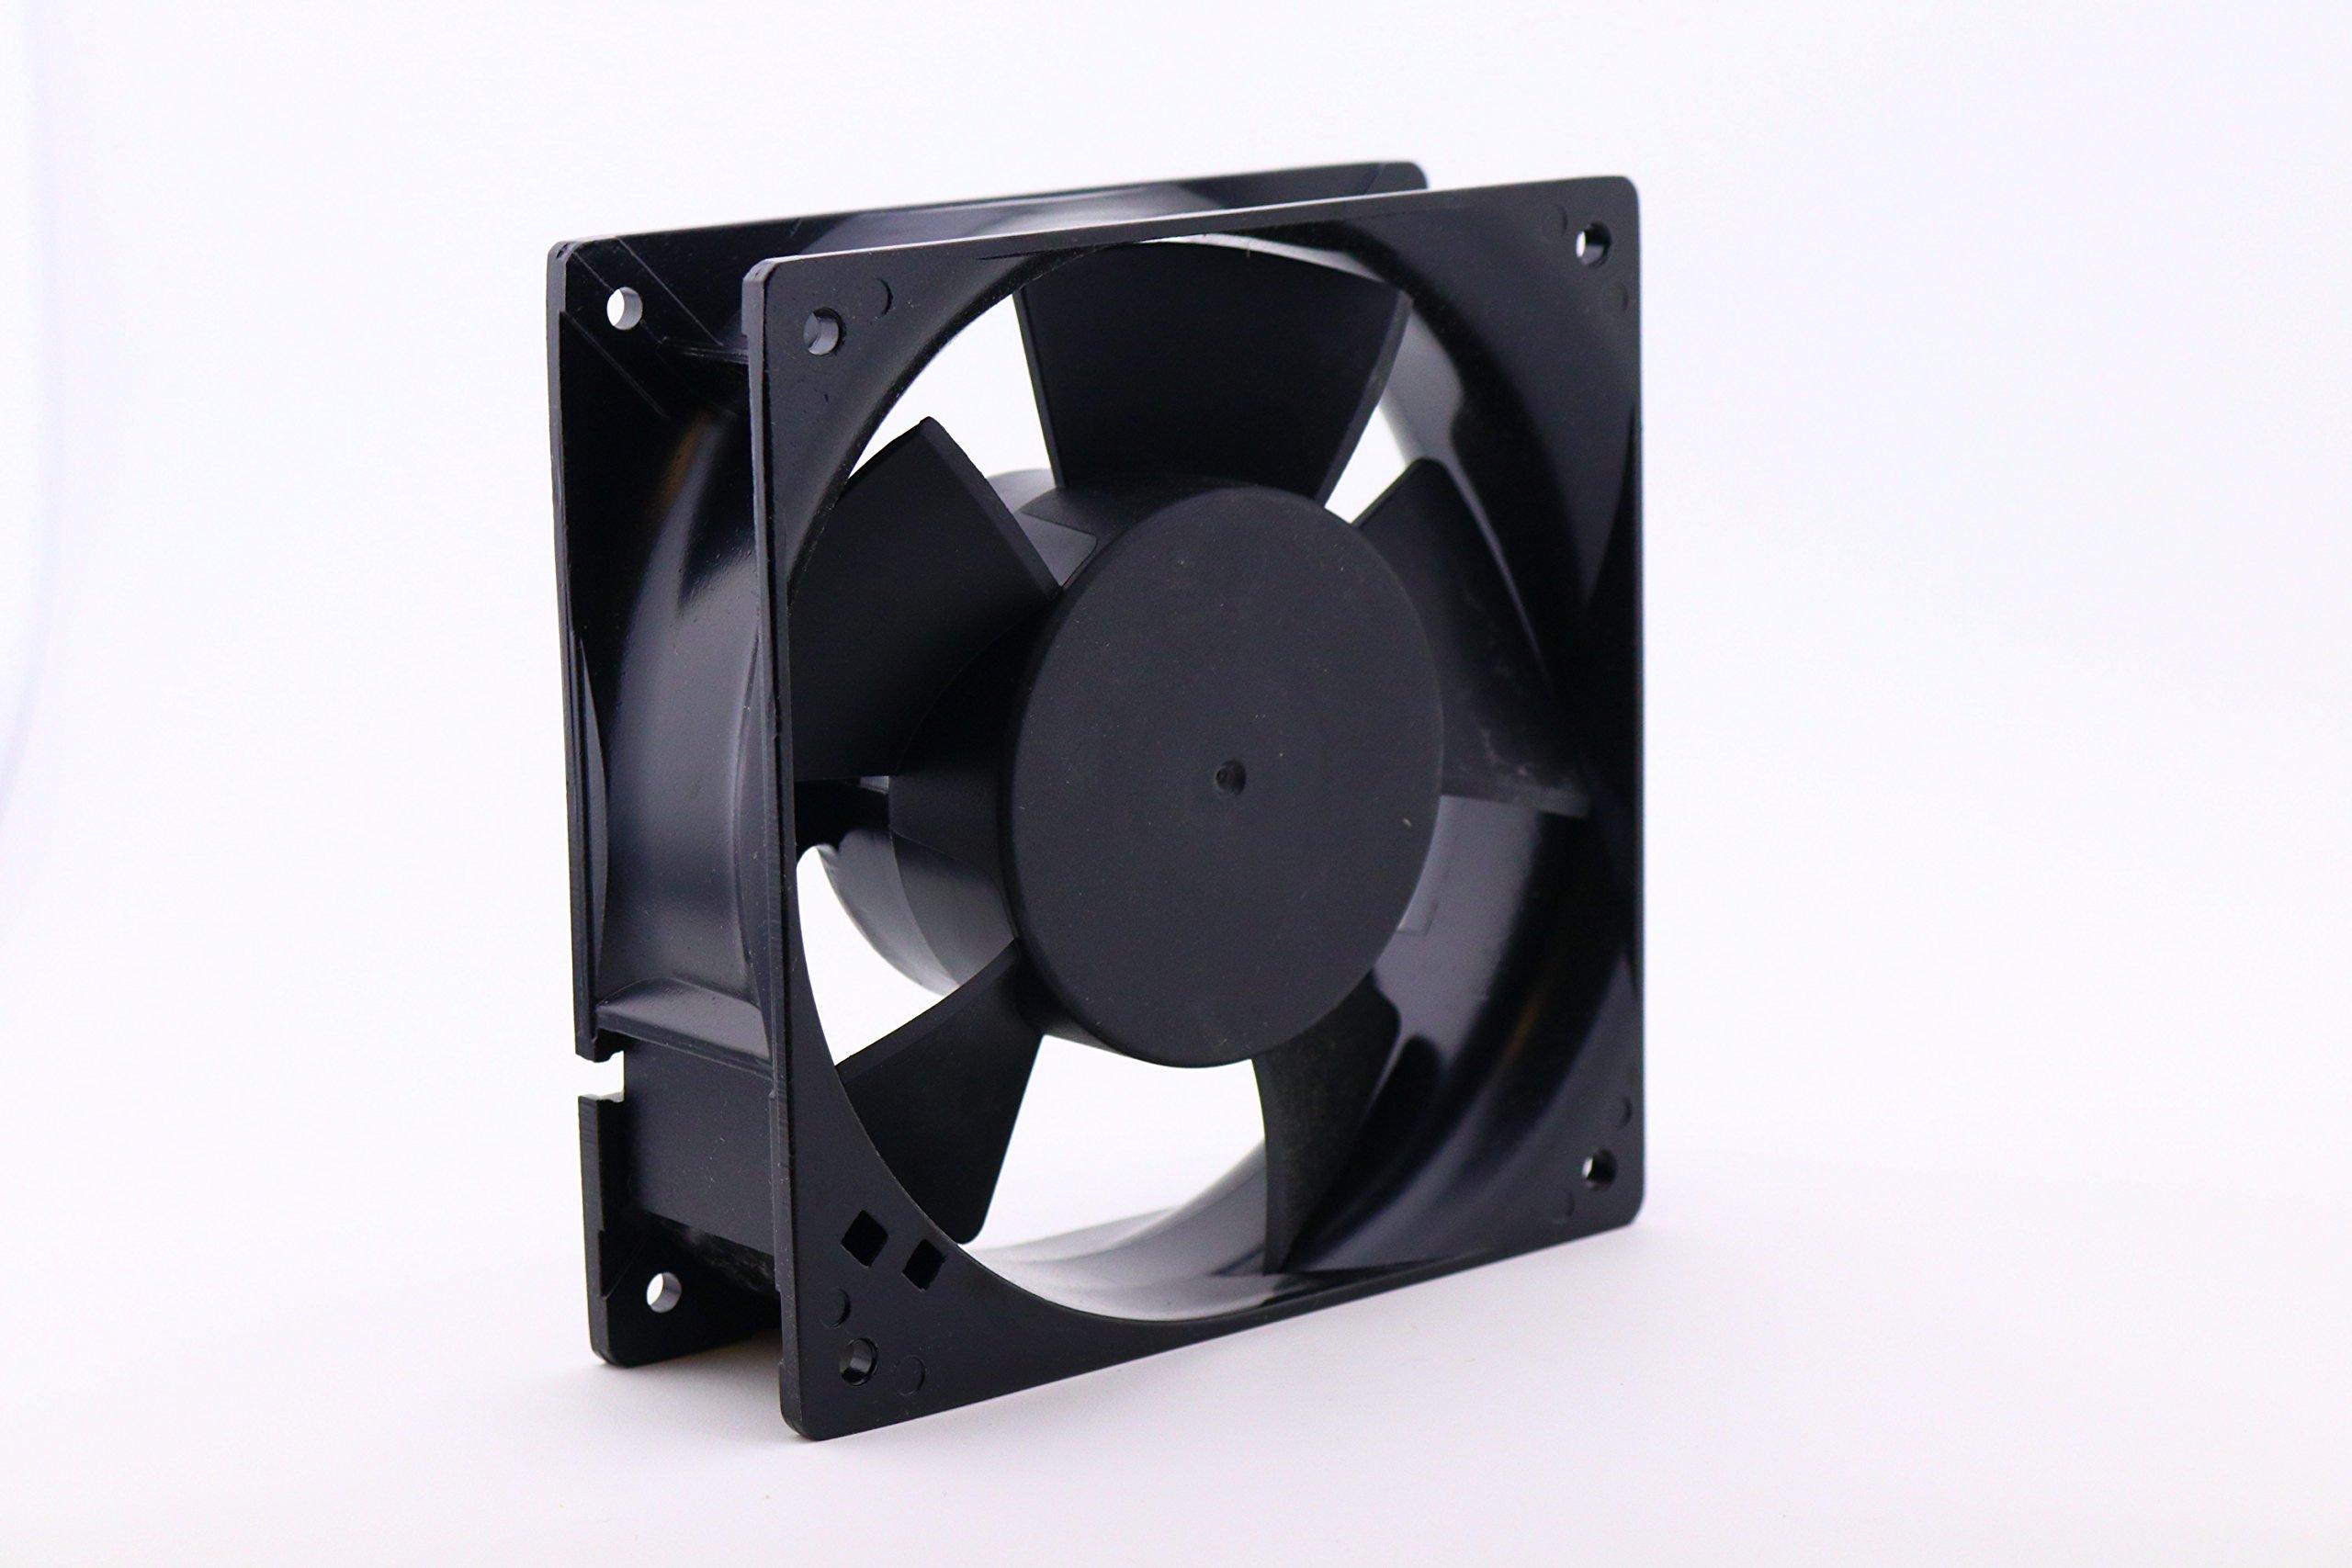 KNIGHT ELECTRONICS ORION FANS OA109AP-22-1TBR OA109 Series 3000 RPM 120 x 120 x 38 mm 110 CFM 230 V Dual Ball Bearing AC Fan - 1 item(s)